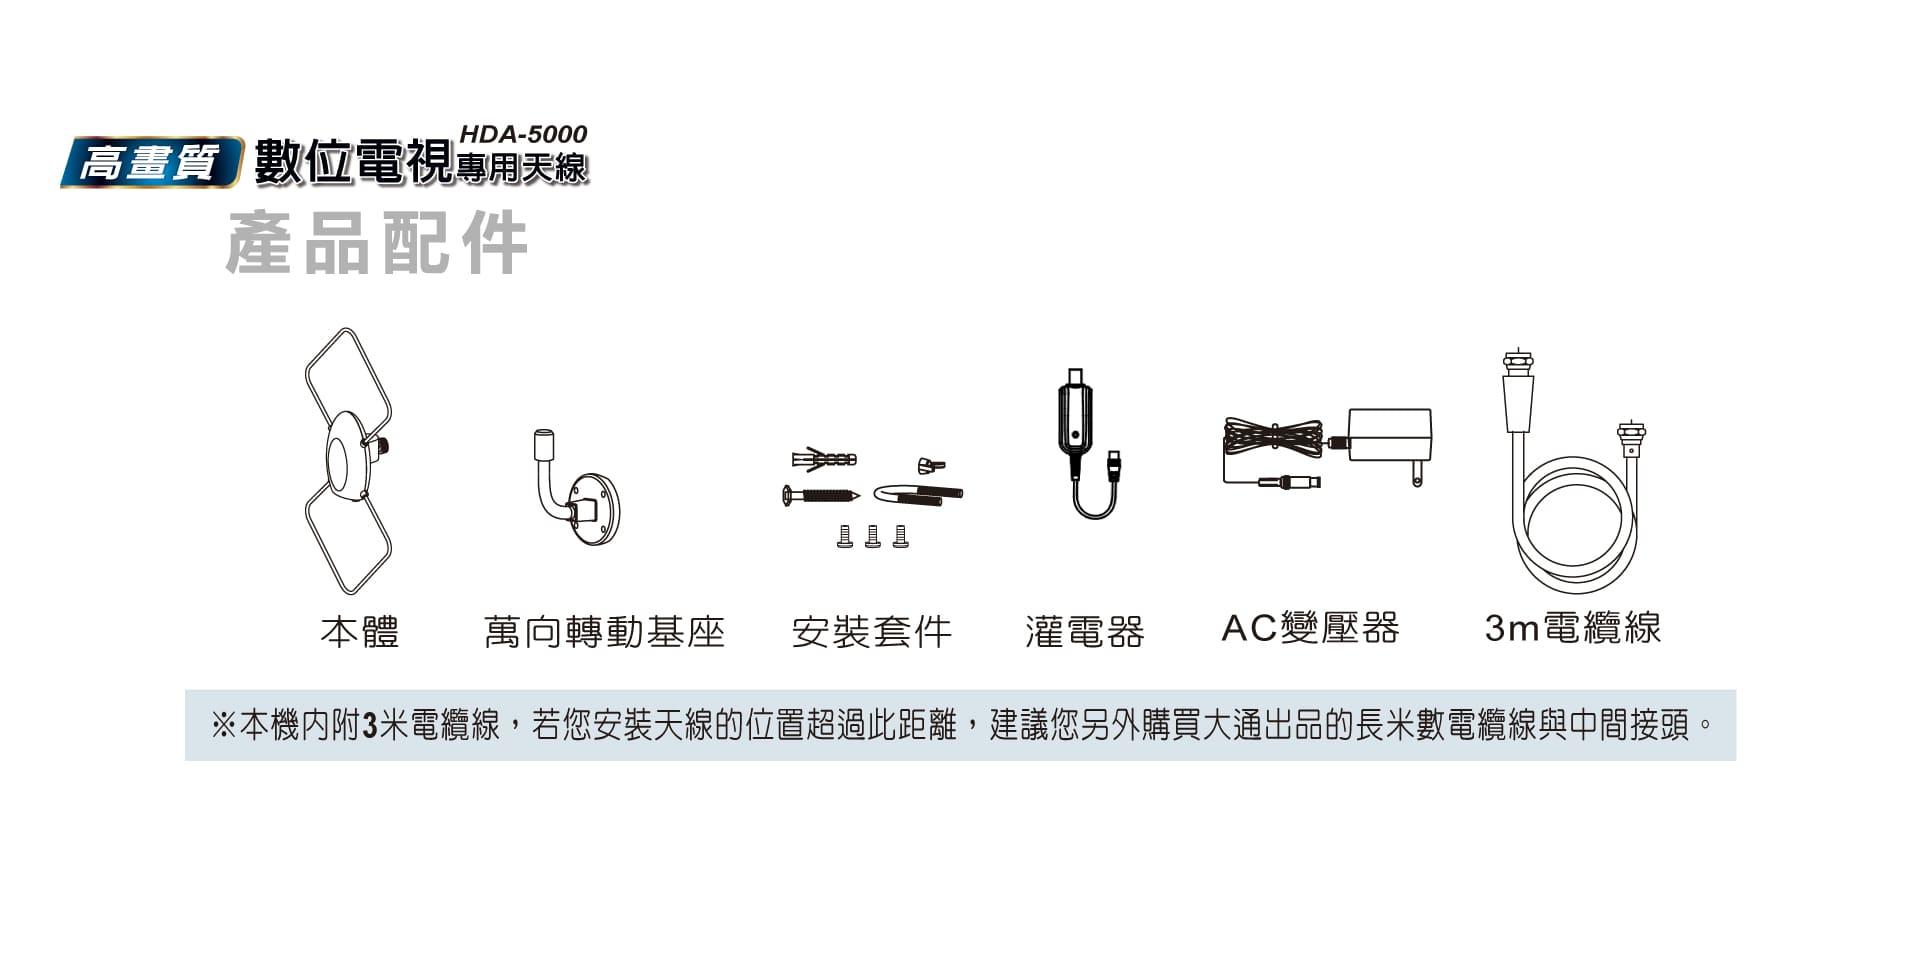 proimages/product/Antenna/HDA-5000/HDA-5000-05.jpg